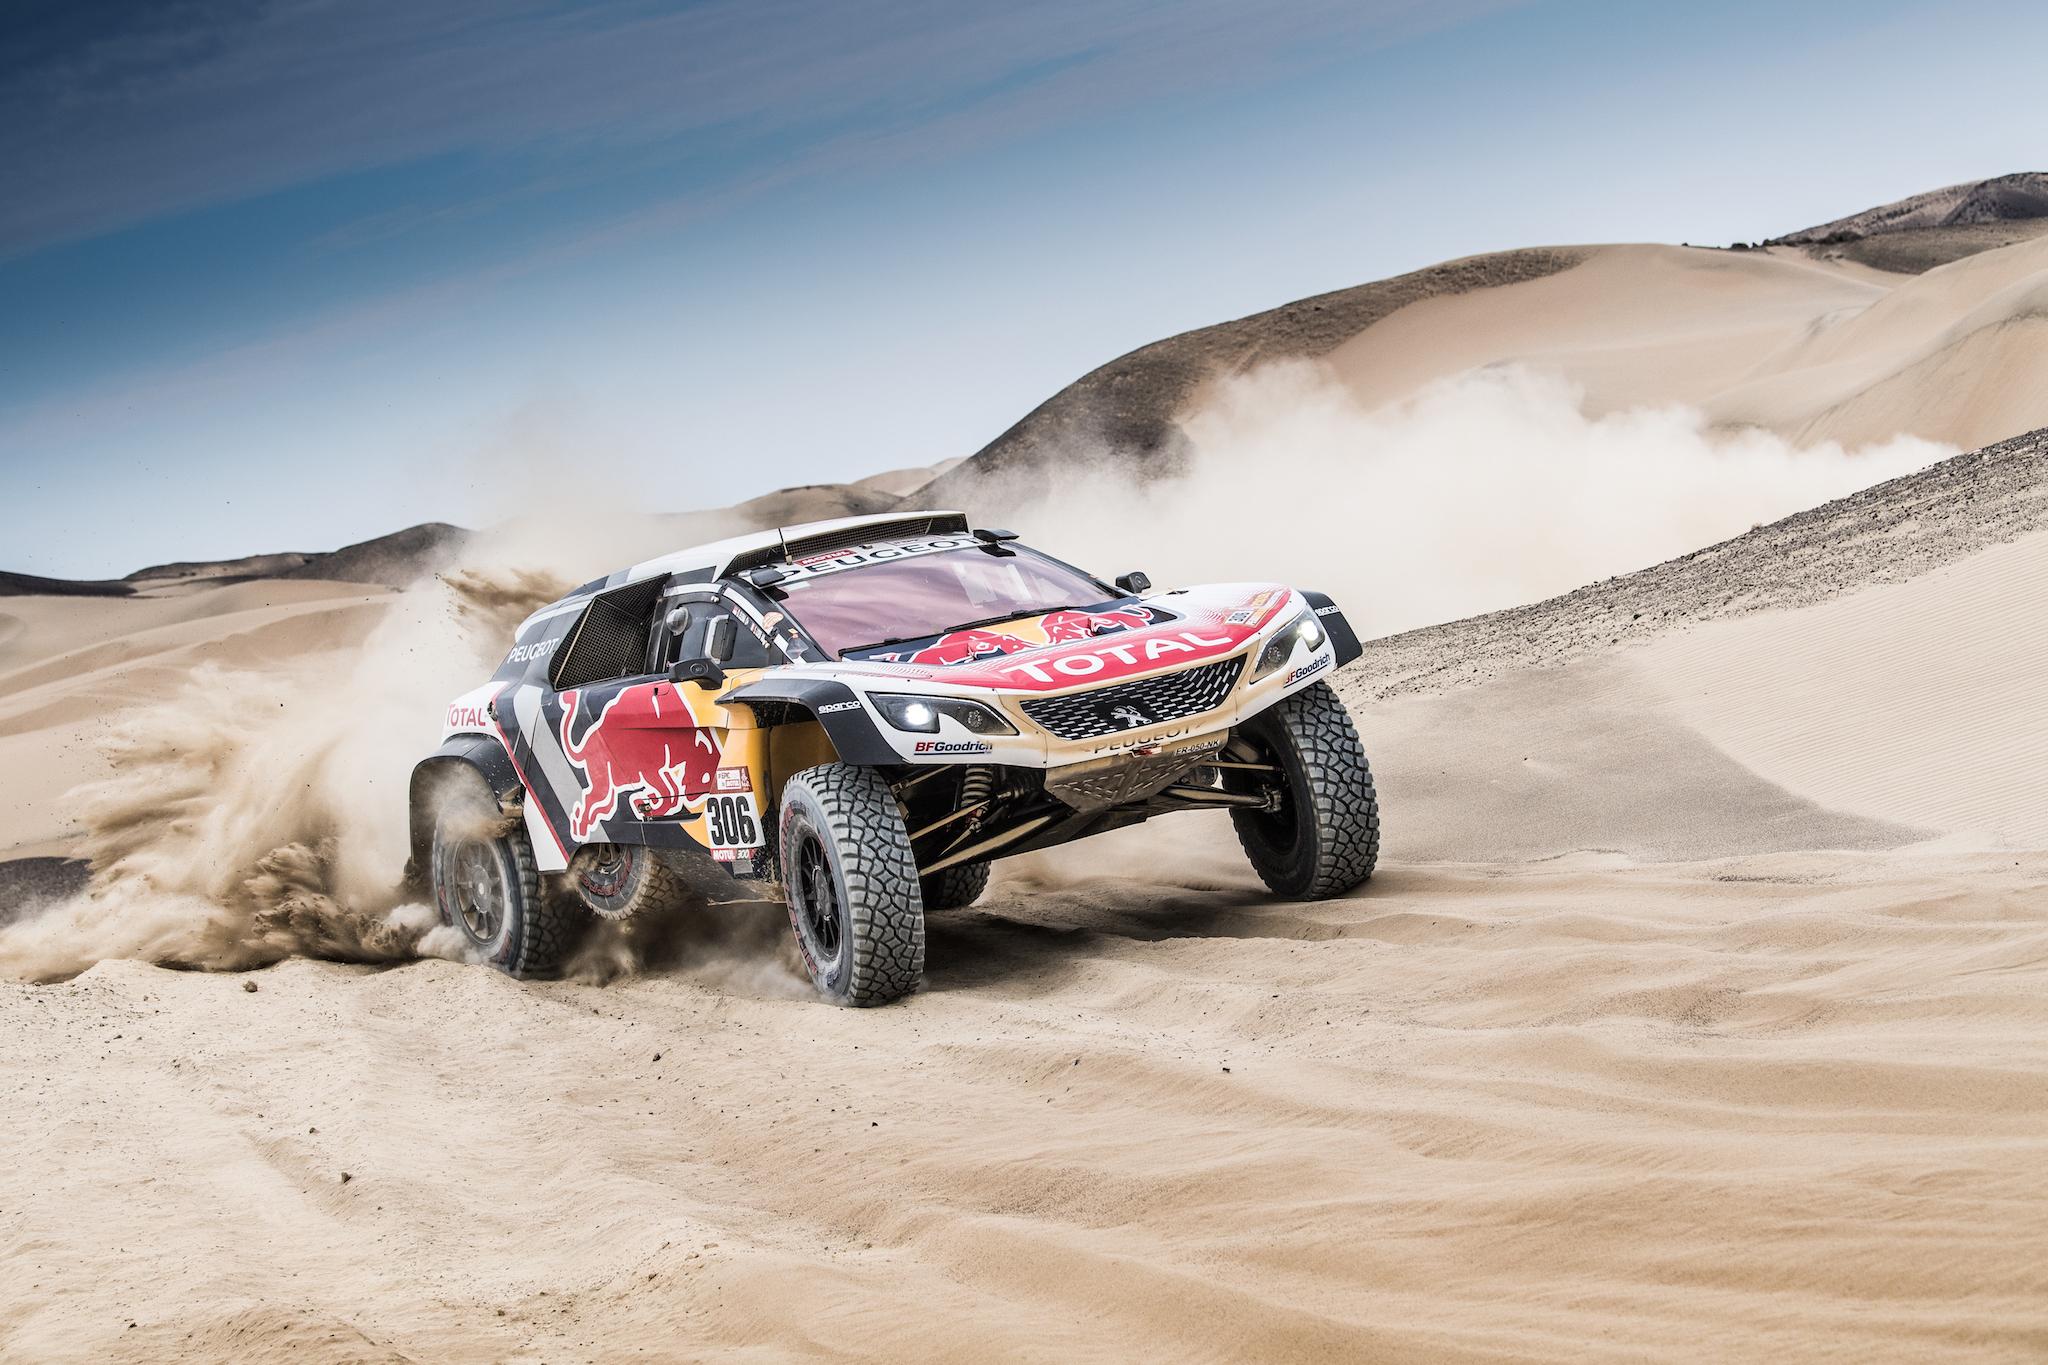 Peugeot team Dakar 2018 - 2048x1365